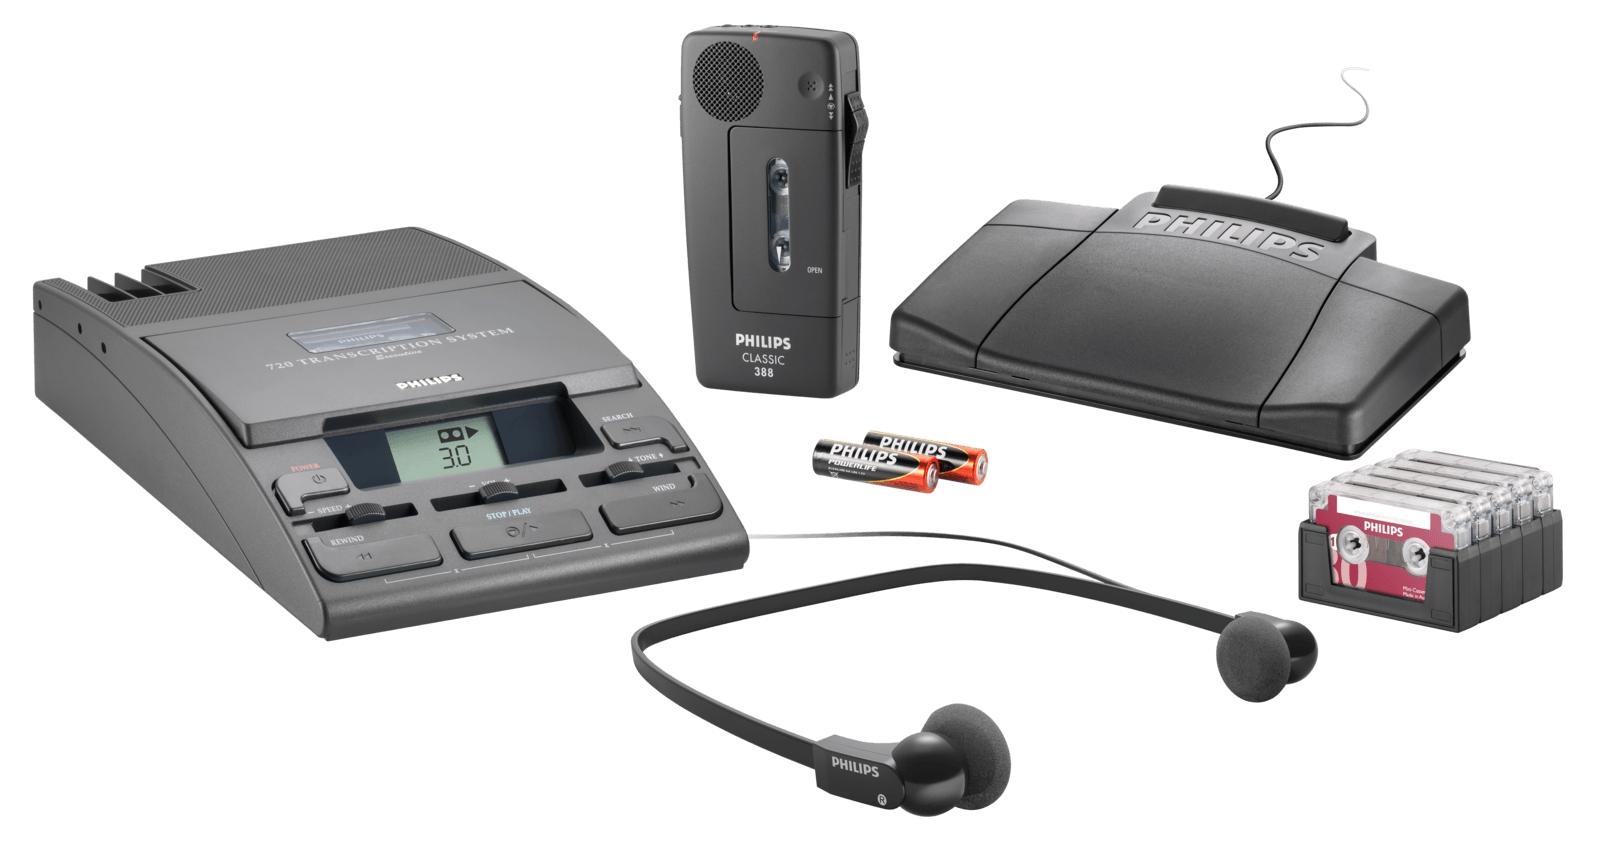 Mini Cassette Tape Dictation. Micro Cassette Tape Dictation. Analogue dictaphones. Tape dictaphones & transcribers